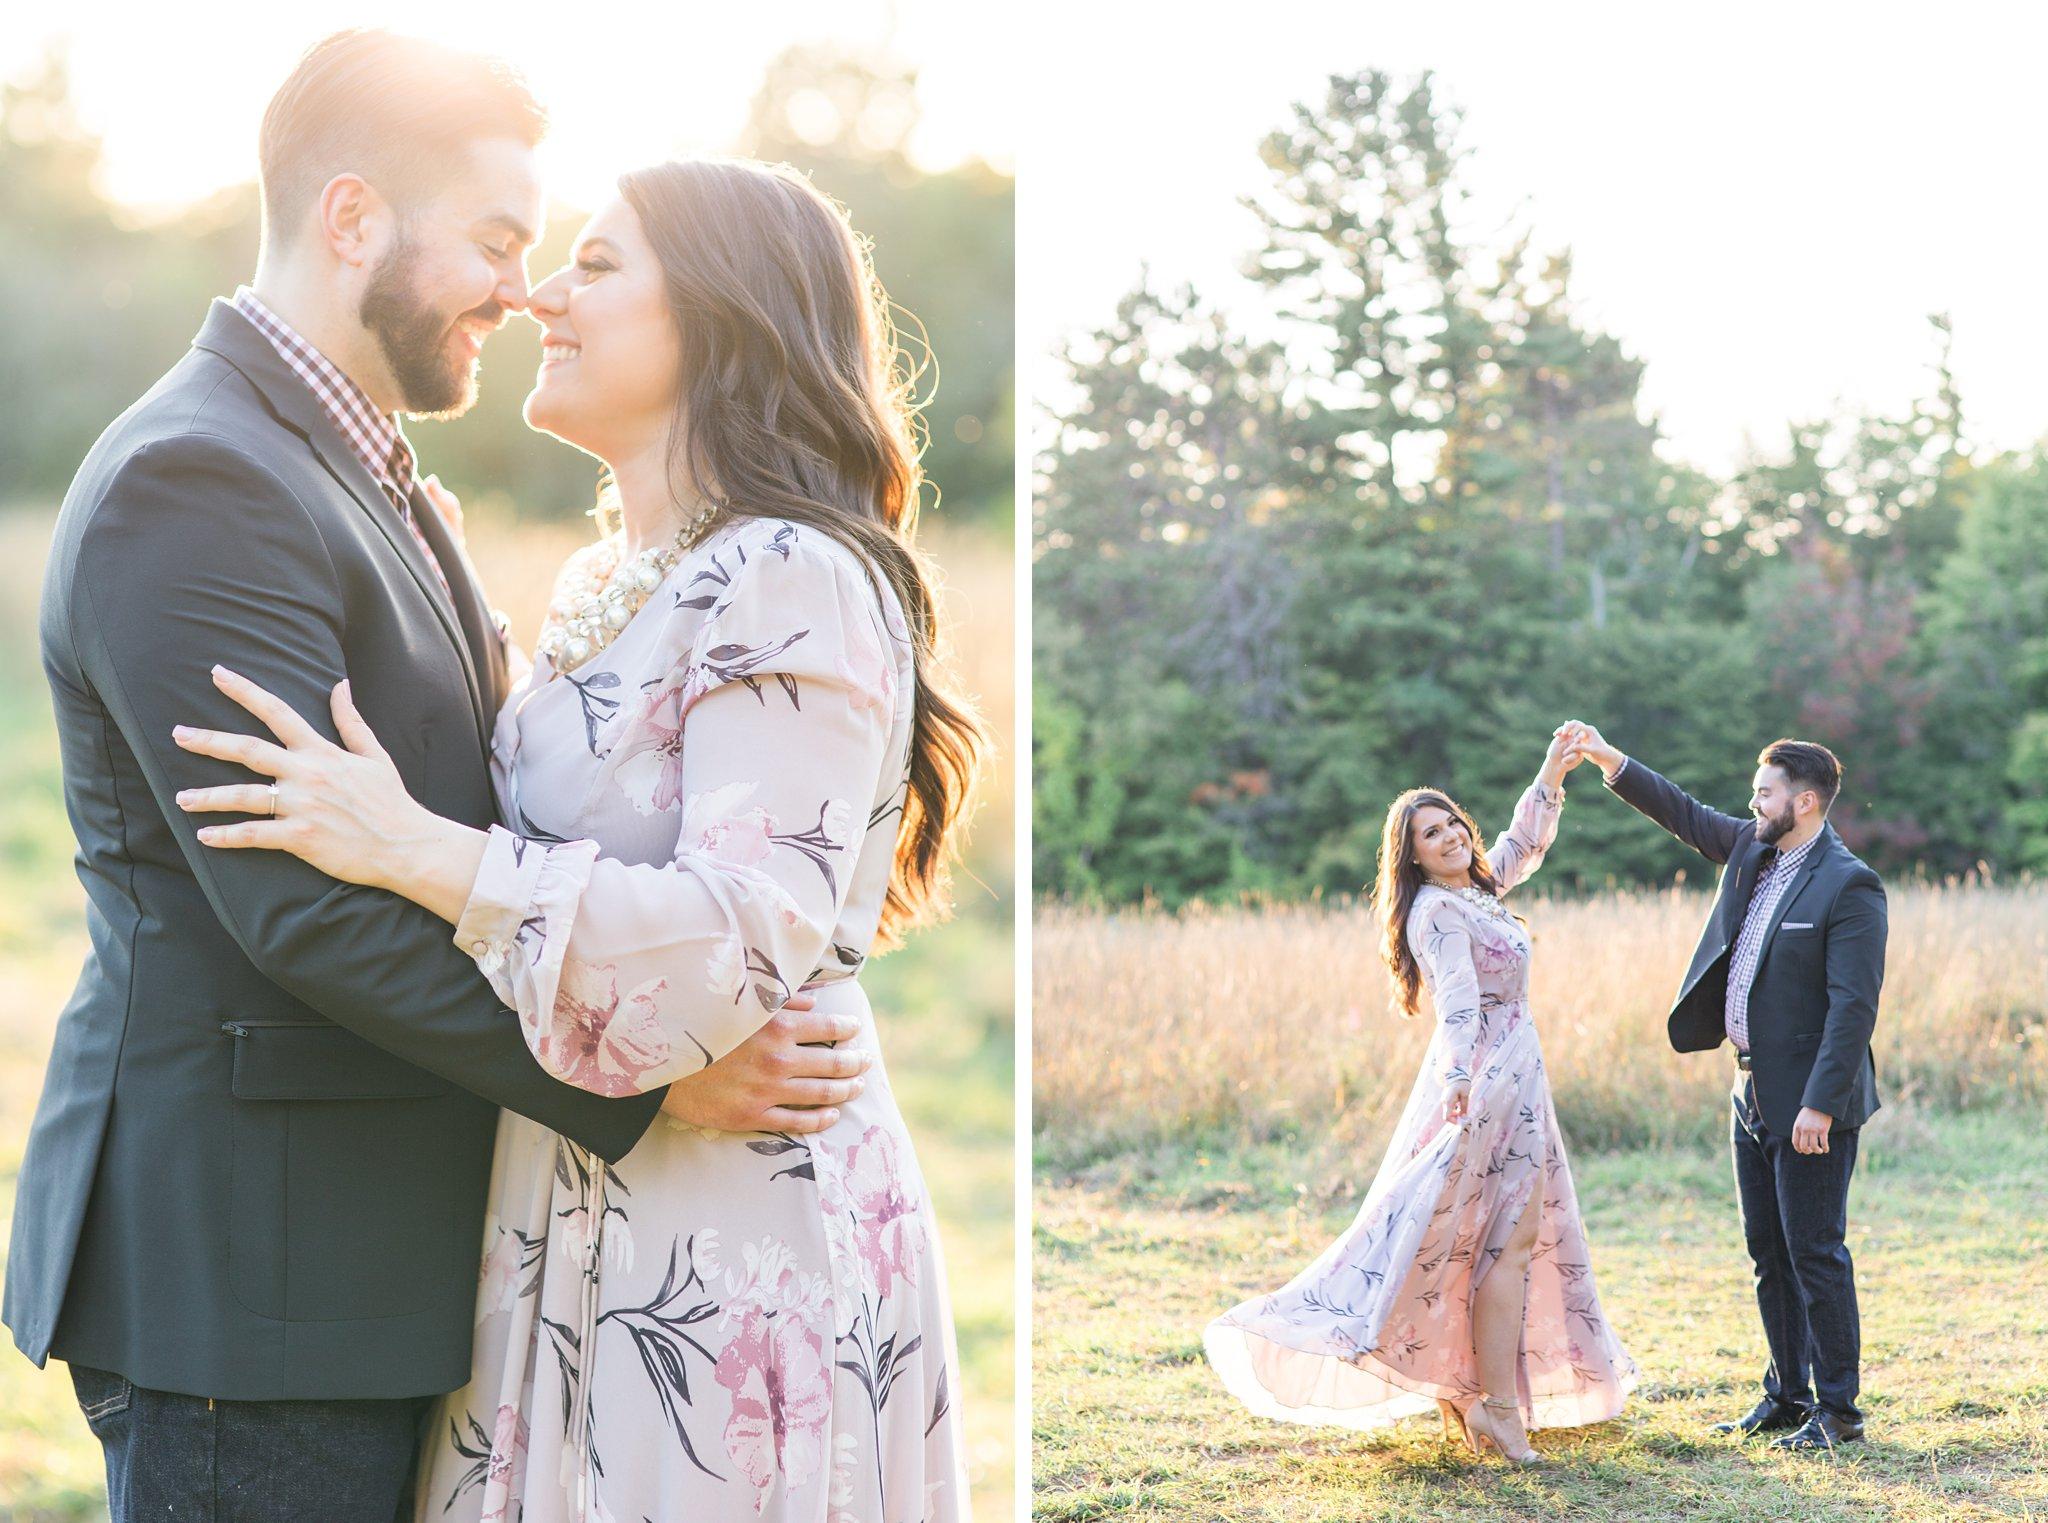 Sunset photos, purple long sleeve dress, Mackenzie King Estate Engagement Photos by Amy Pinder Photography